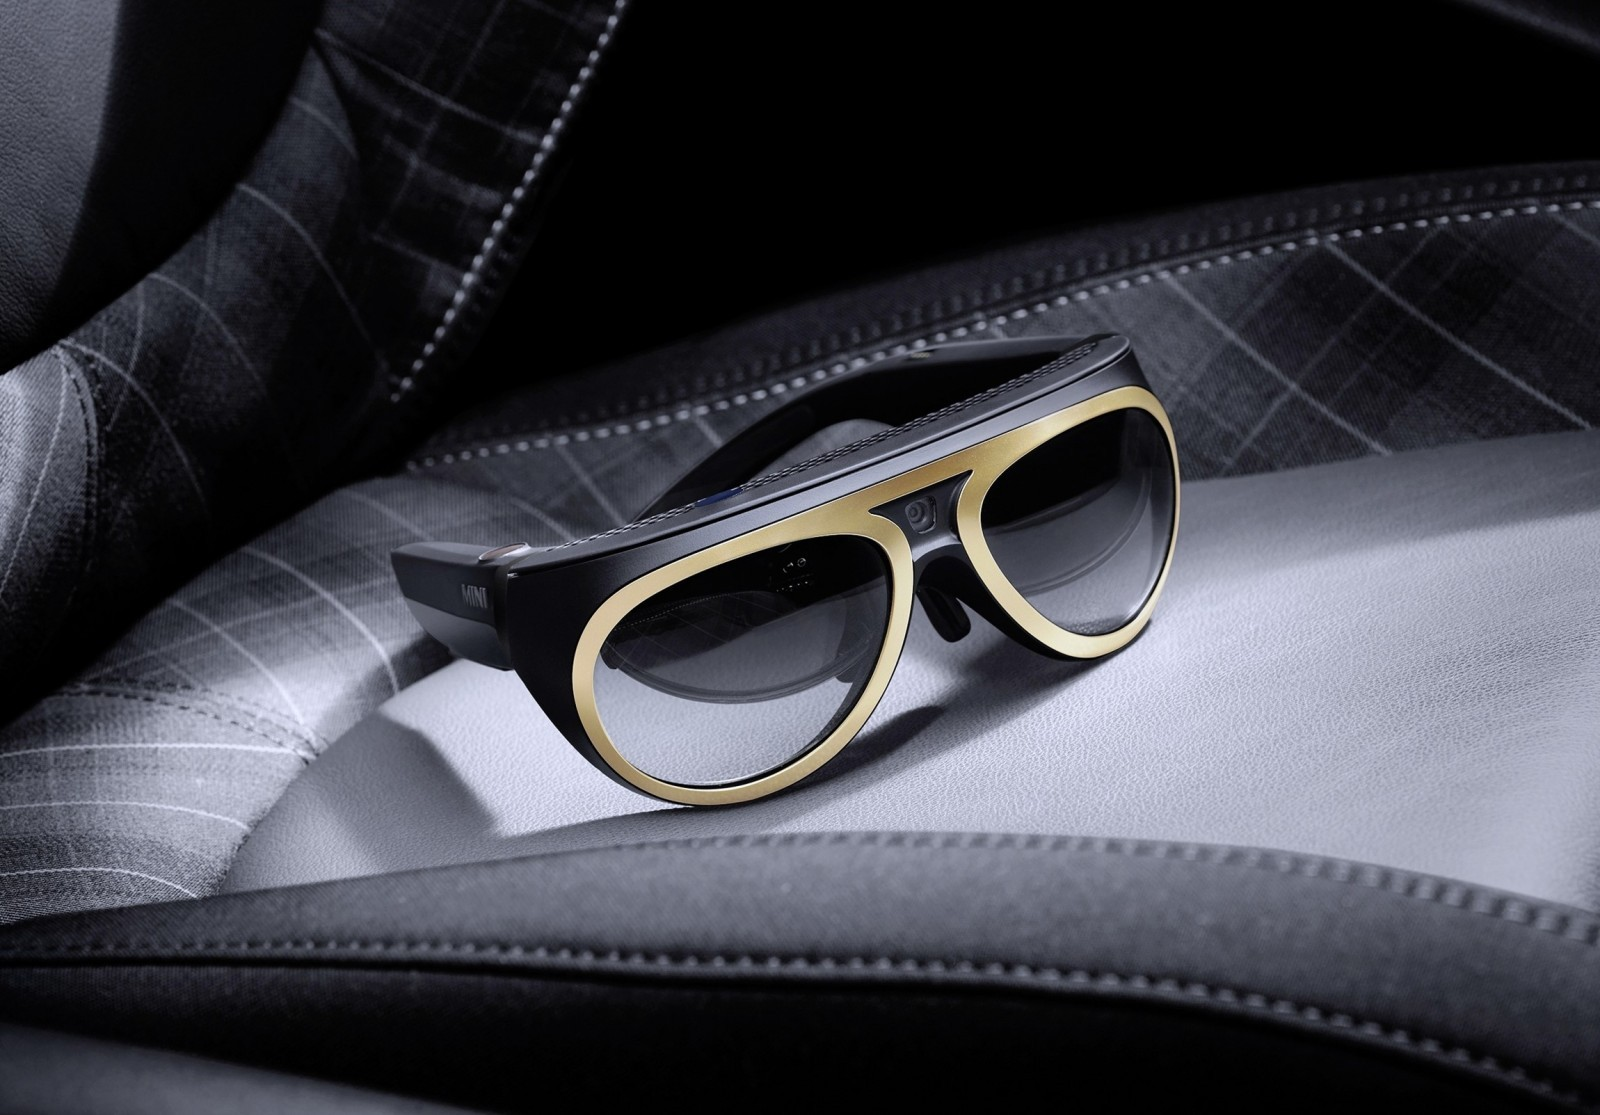 MINI Reveals New Augmented Vision Goggle Concept 15